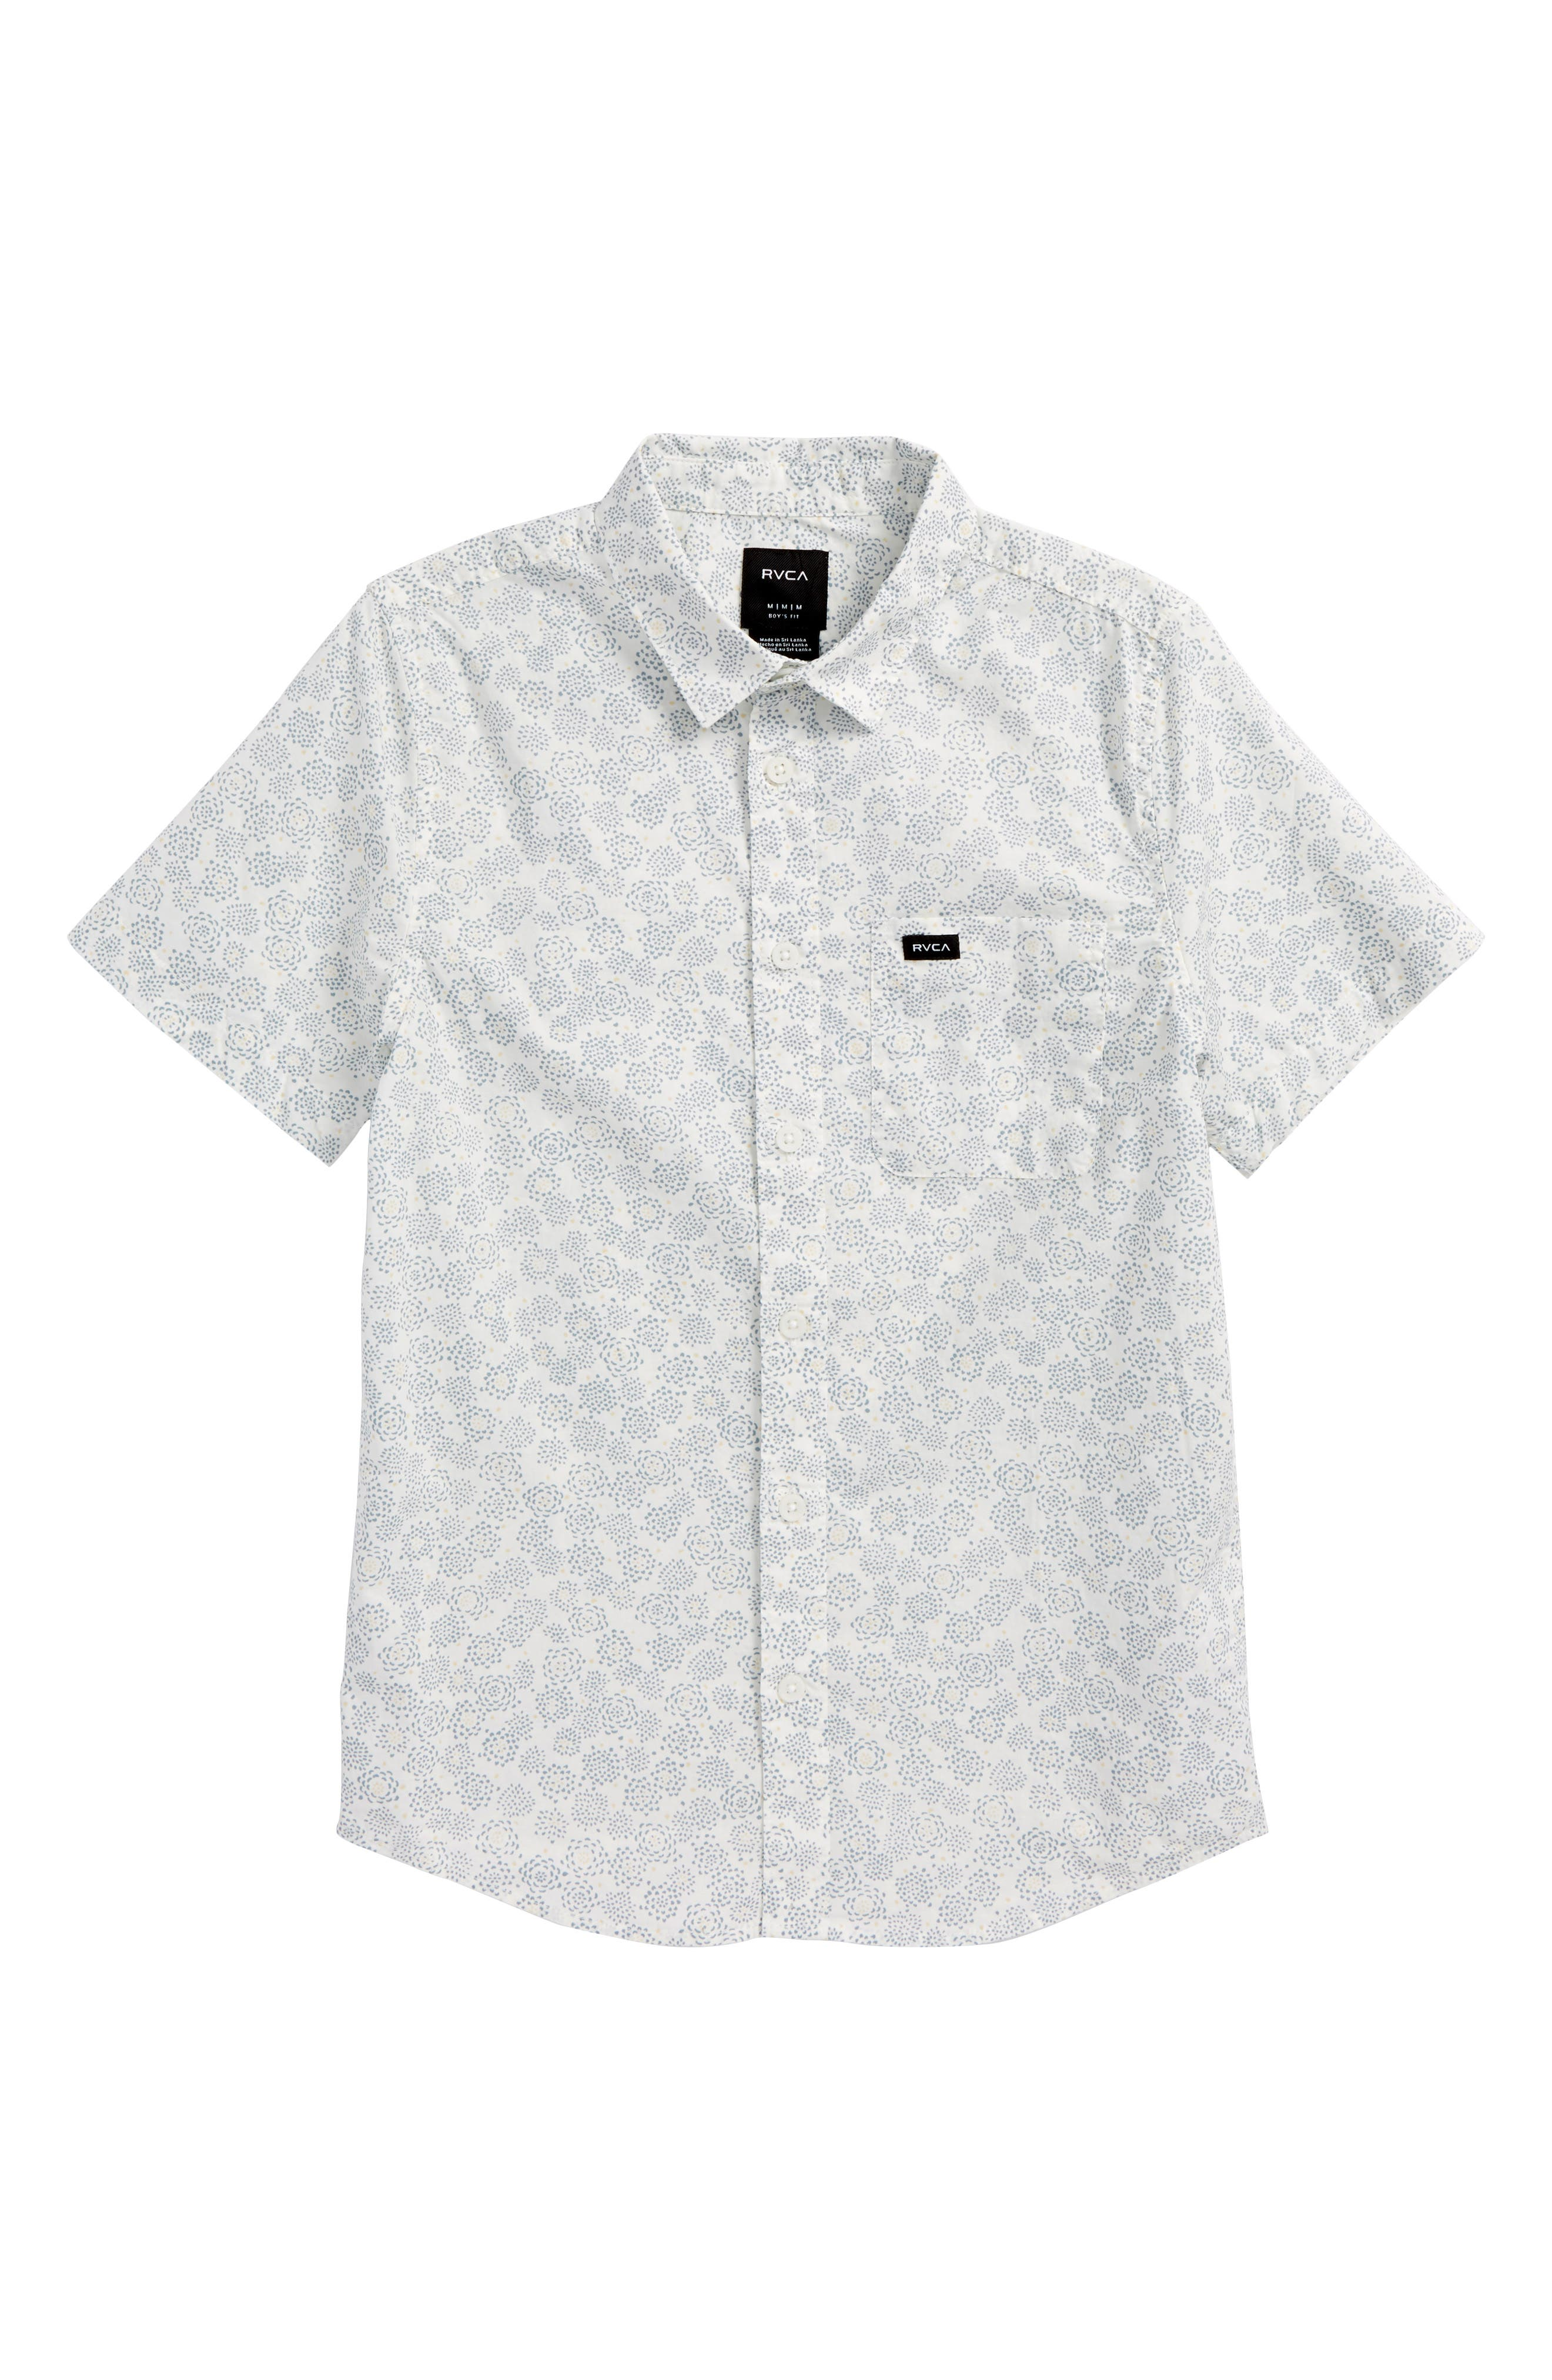 Main Image - RVCA Cleta Woven Shirt (Big Boys)